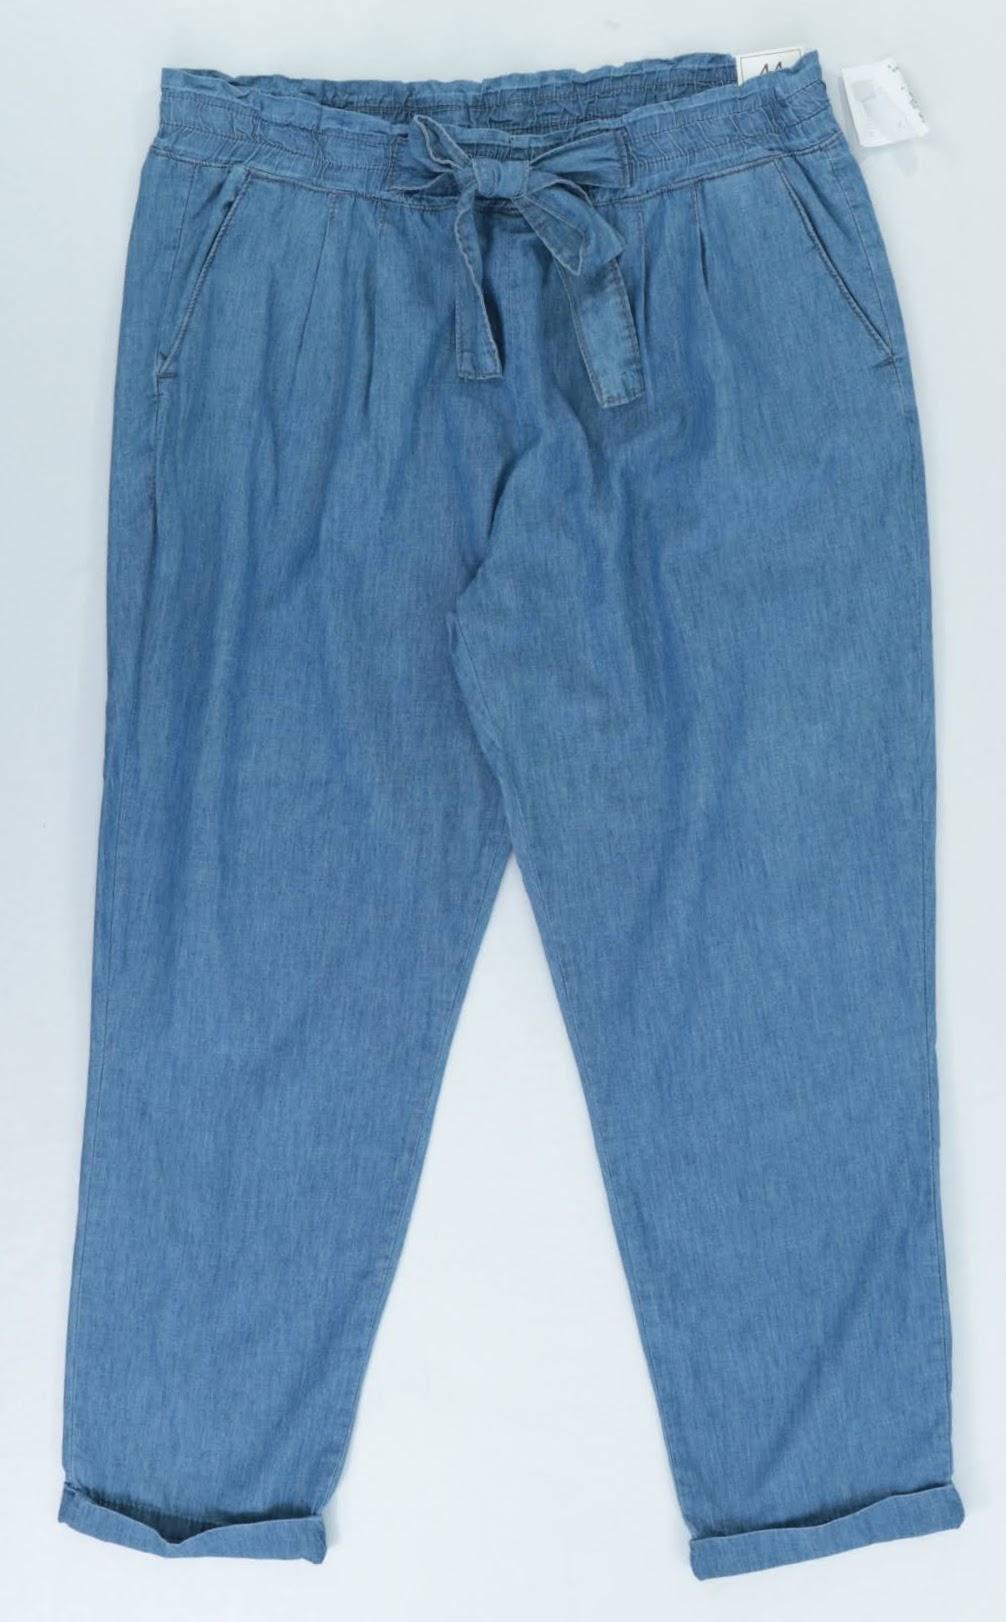 Calça Clochard Jeans - Yessica - 44